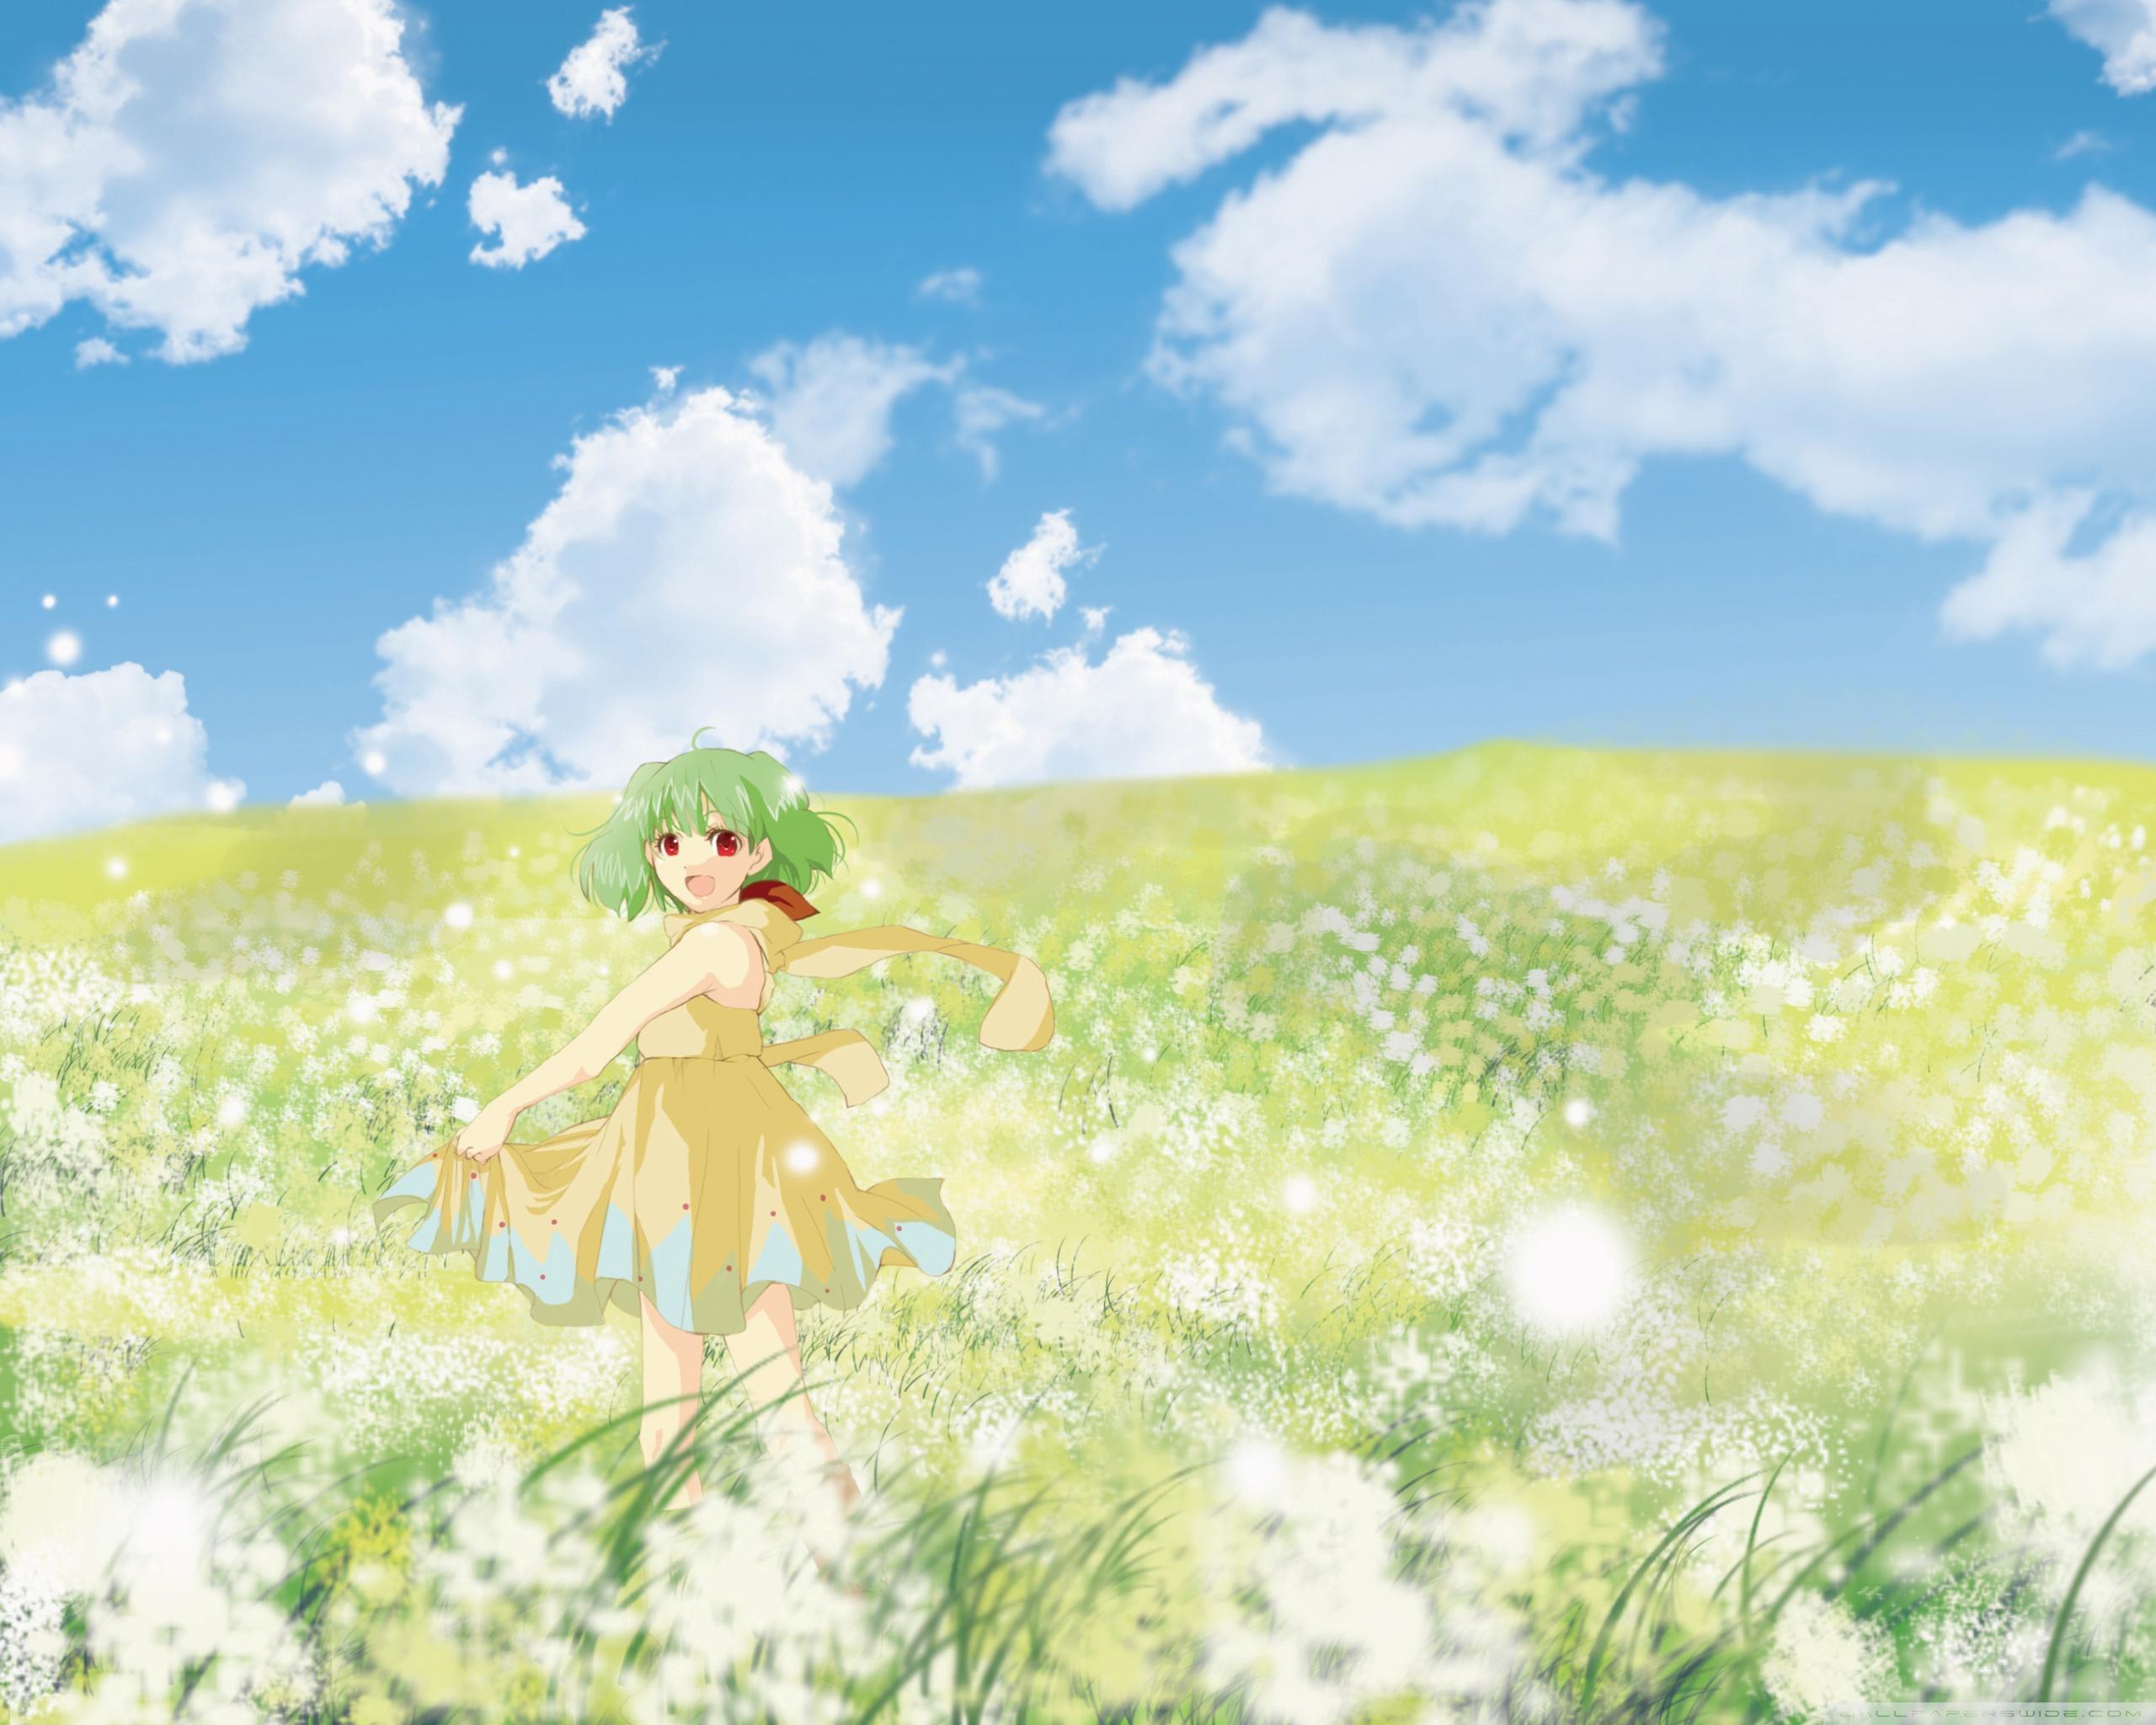 Anime Flower Wallpaper Posted By Michelle Peltier